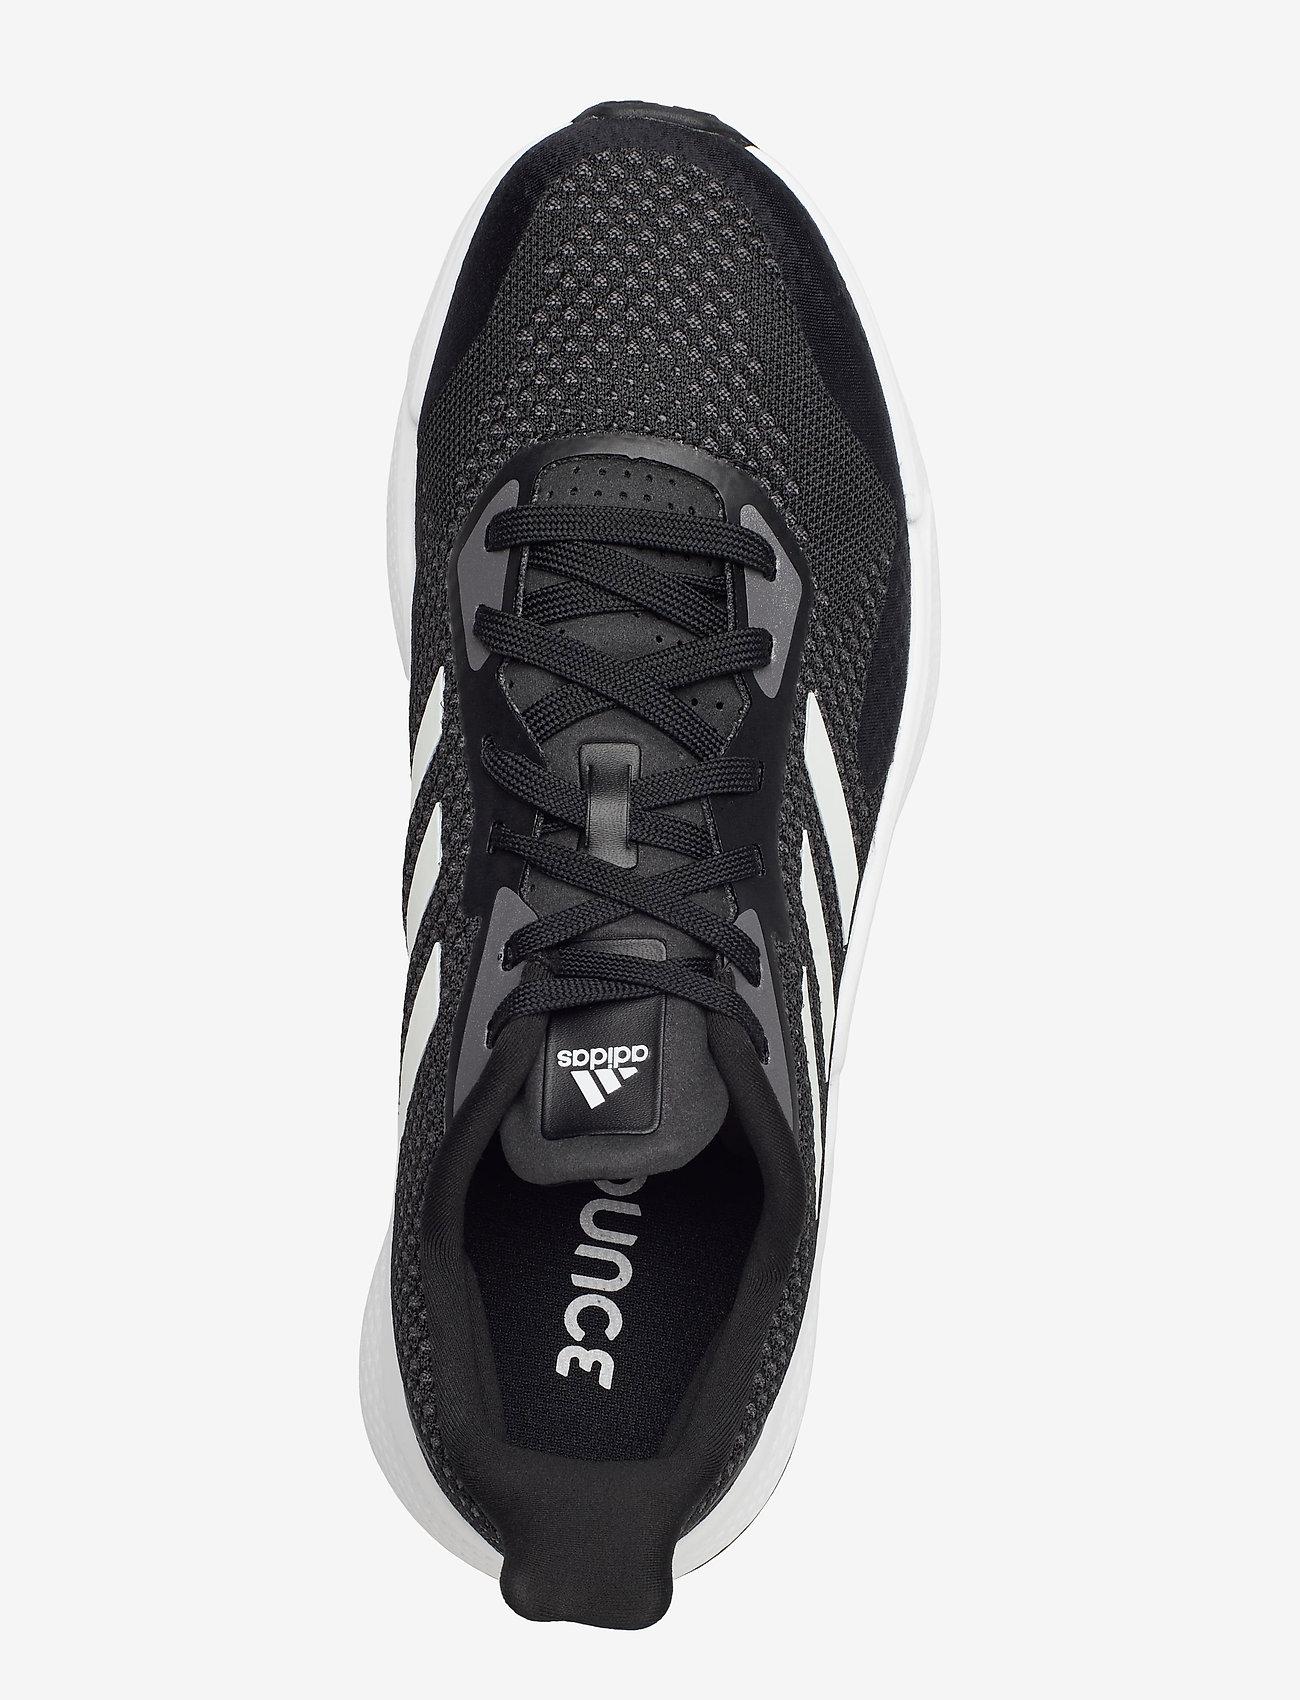 X9000l2 M (Cblack/ftwwht/grefiv) (100 €) - adidas Performance MEJ6m